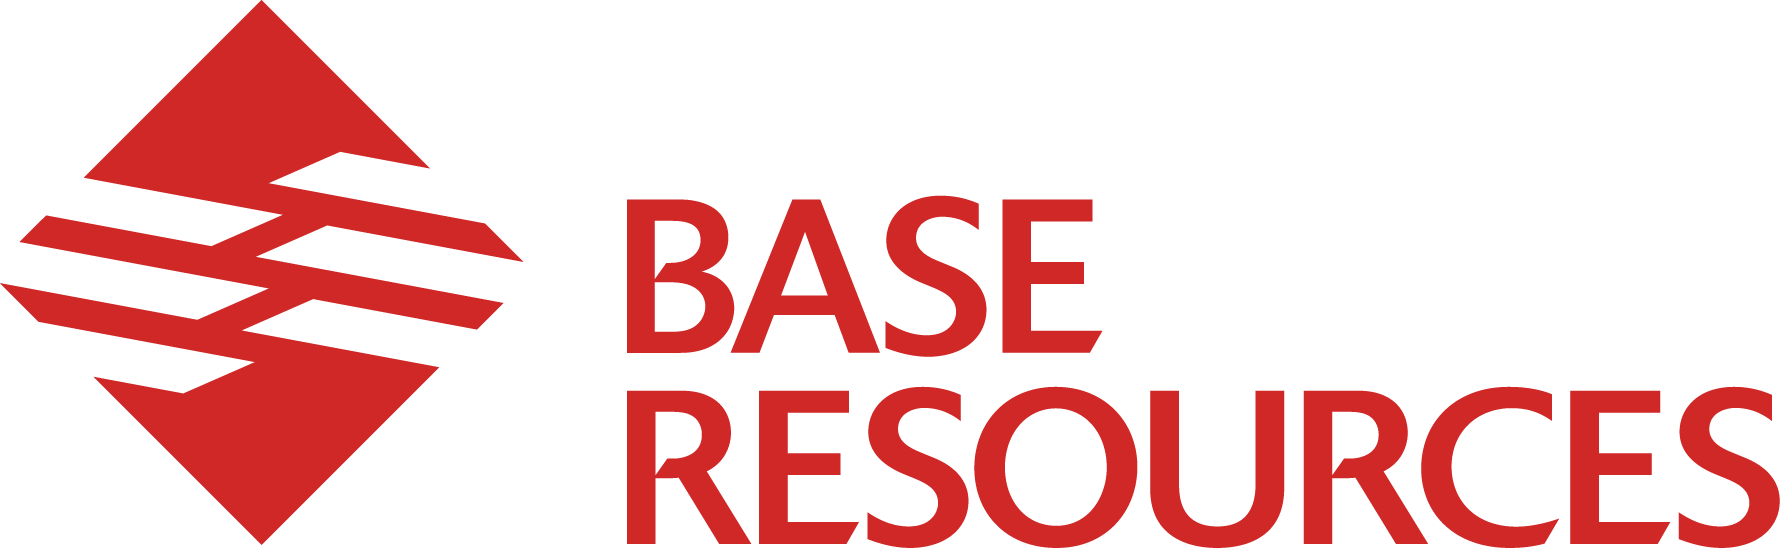 BASE RESOURCES LIMITED Logo